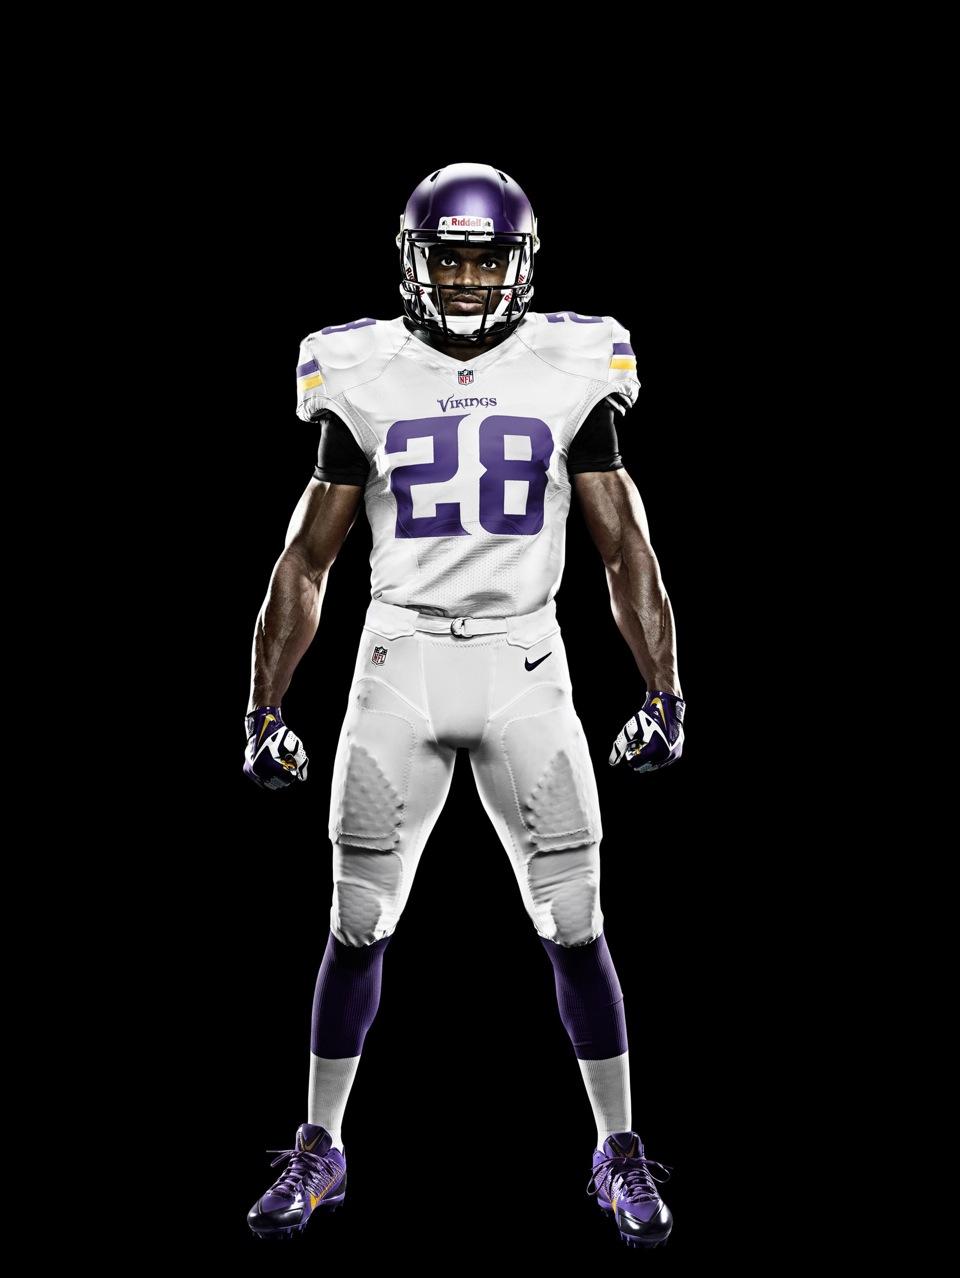 Viking Uniform 44